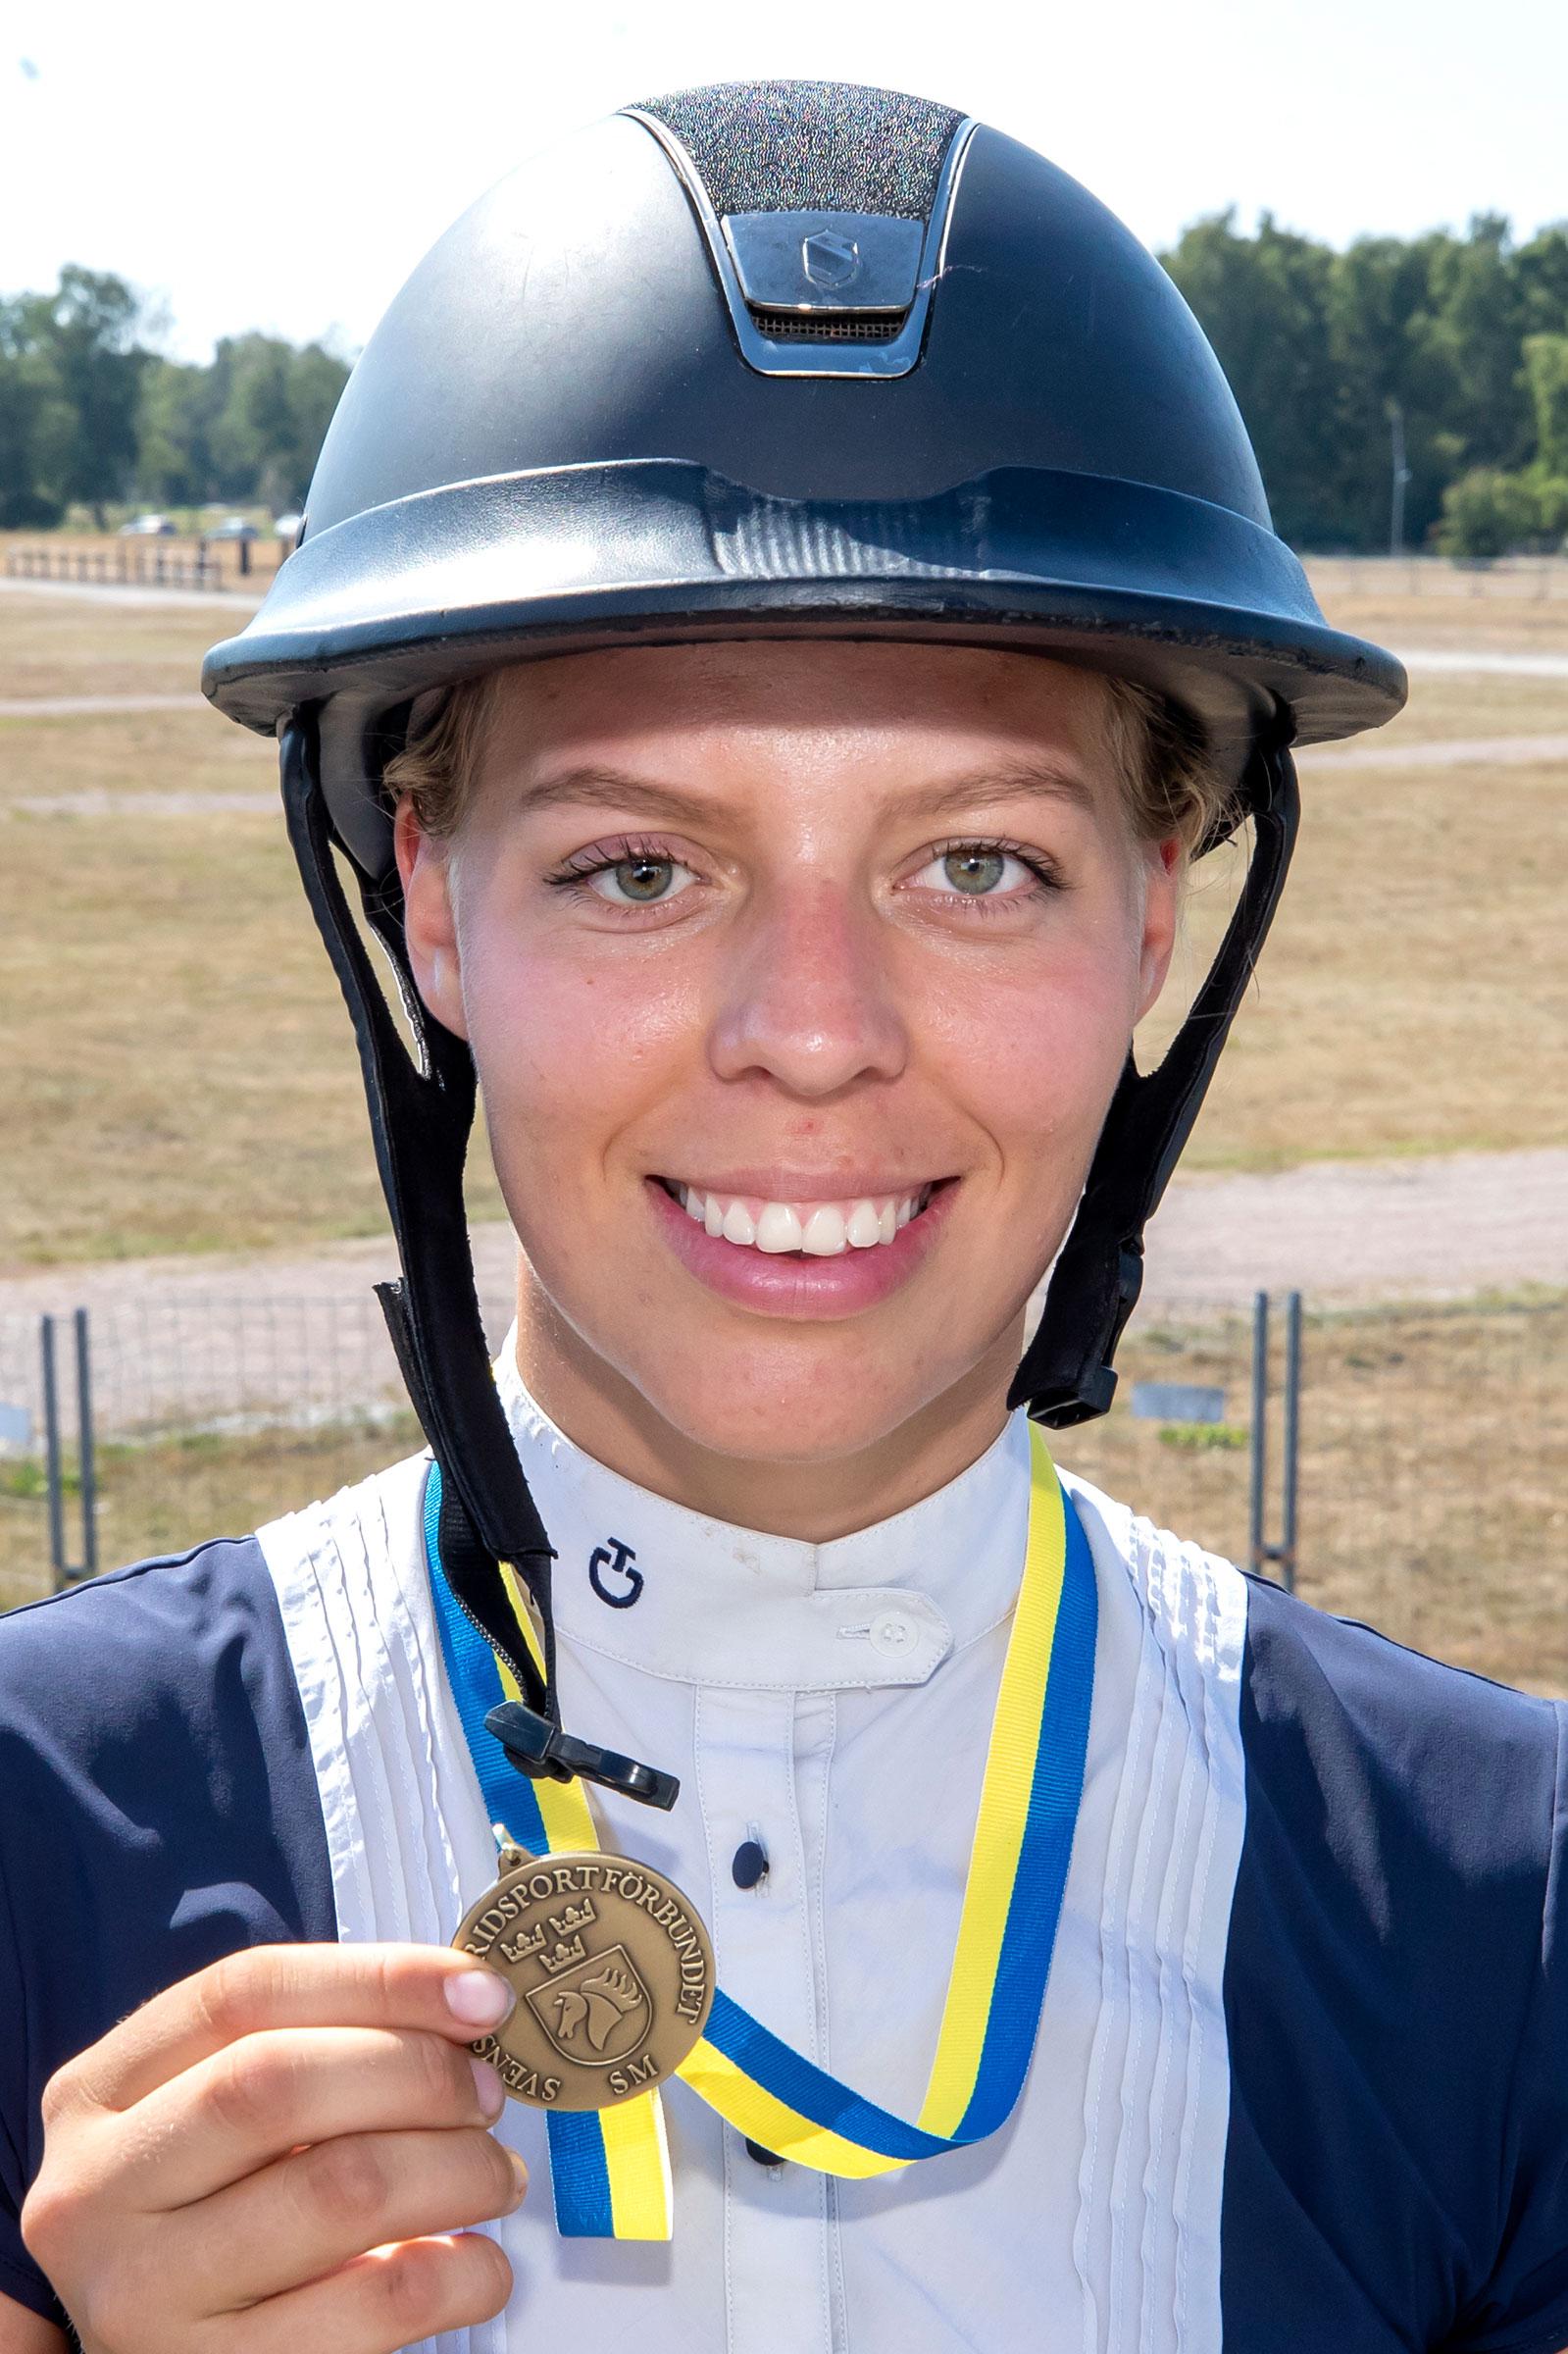 Wilma-marklund-medalj-1-200816-rt